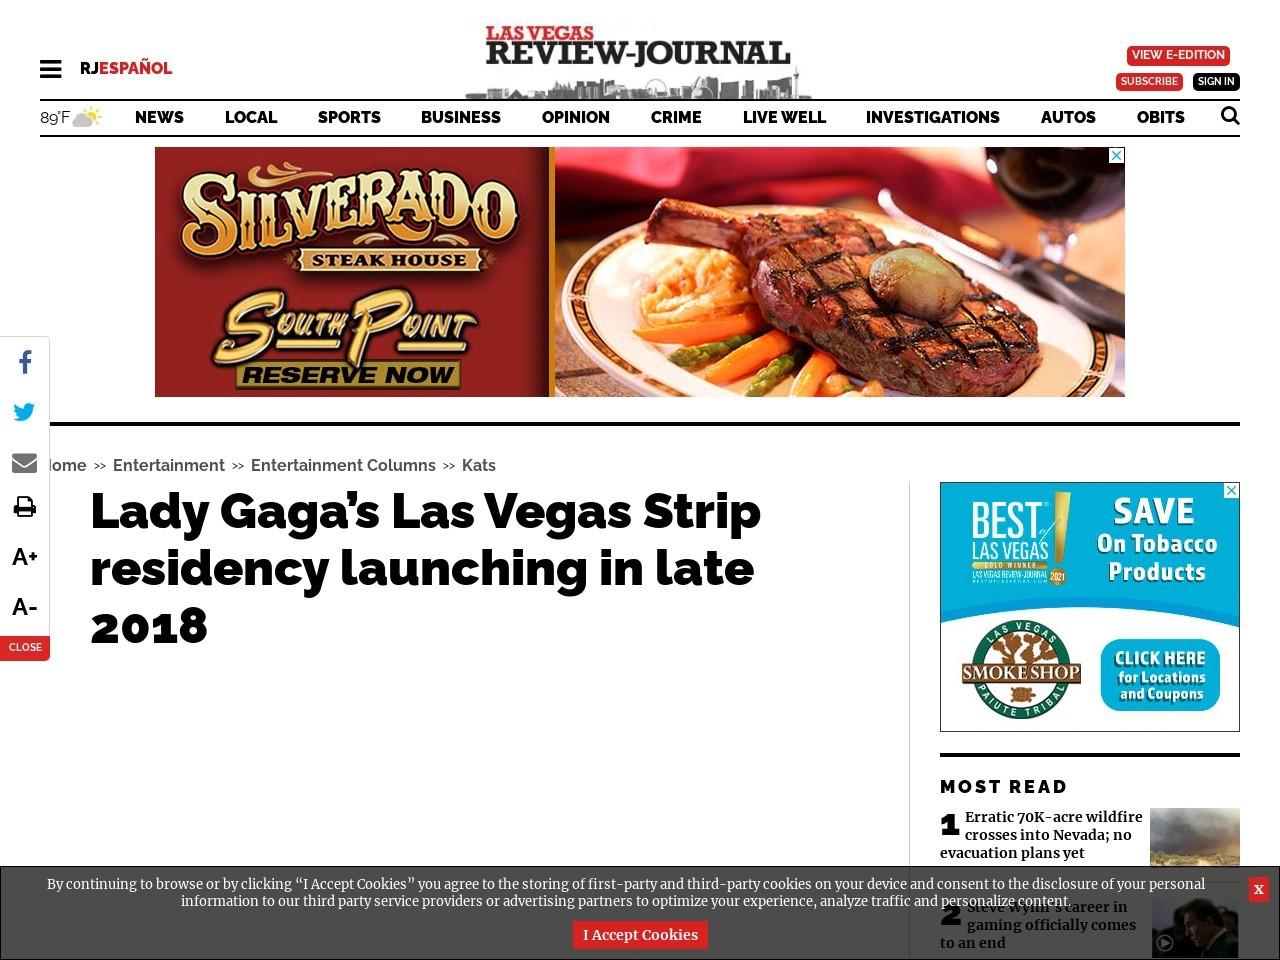 Lady Gaga's Las Vegas Strip residency launching in late-2018